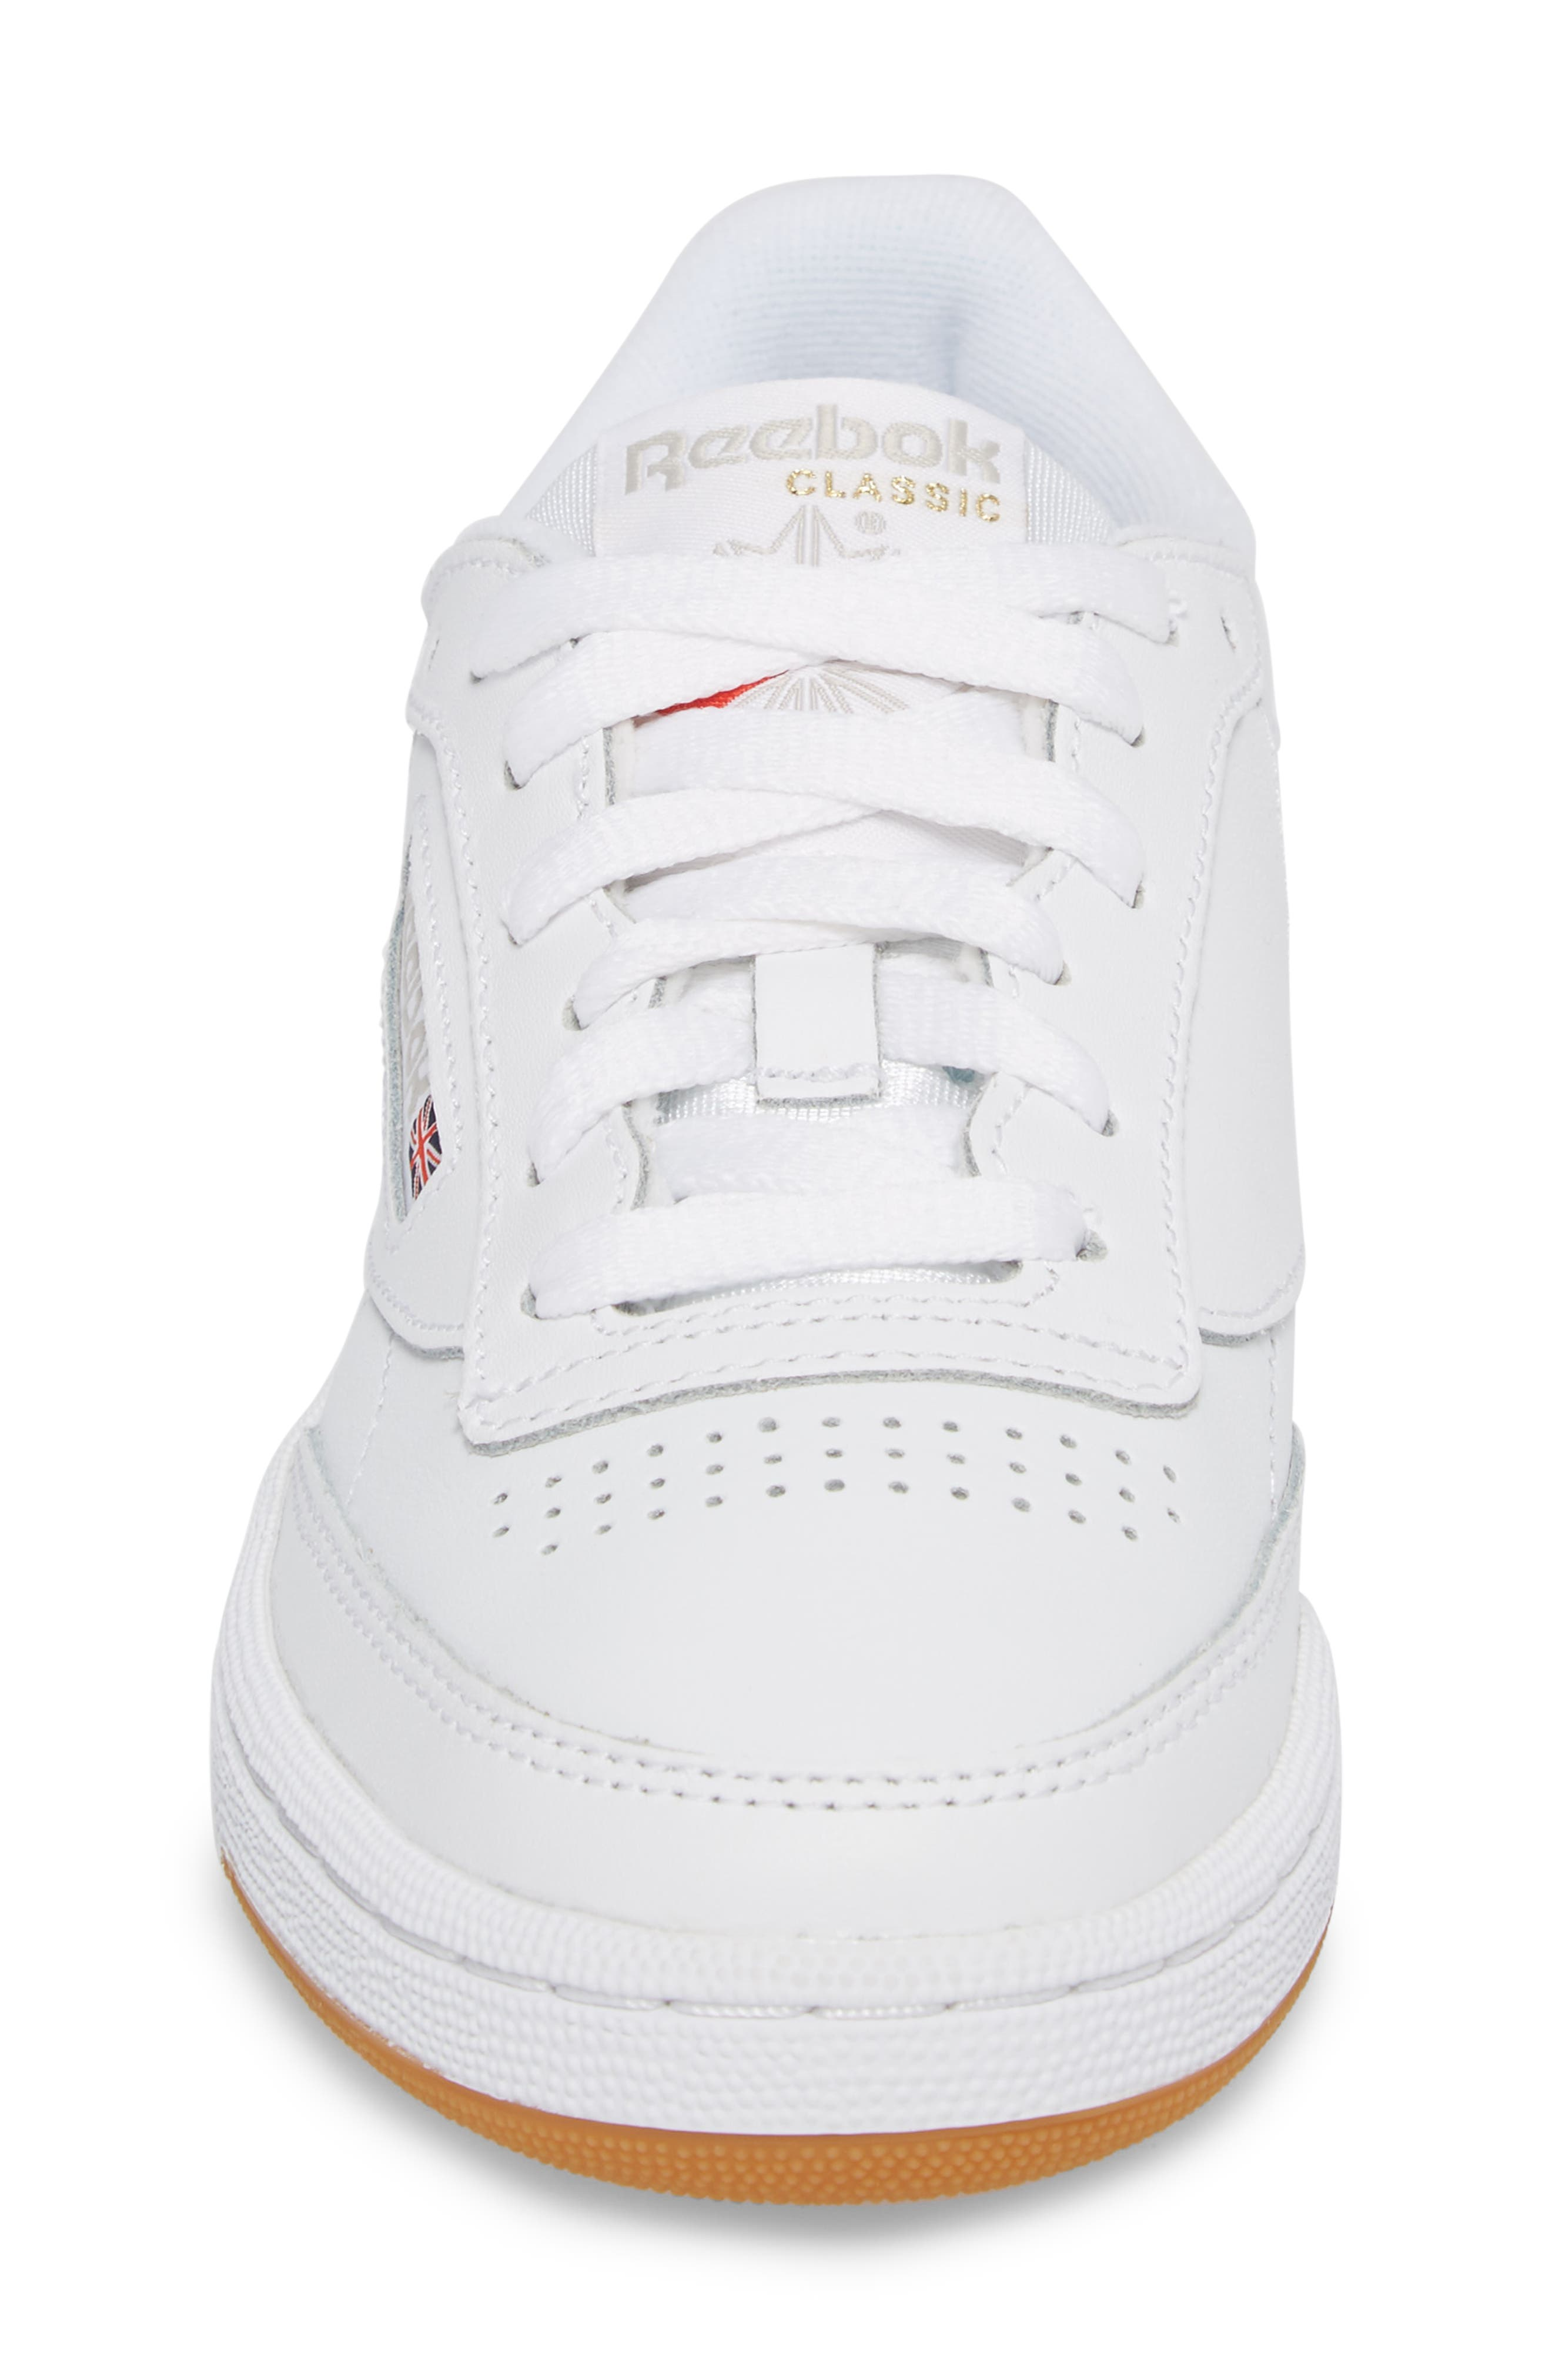 REEBOK, Club C 85 Sneaker, Alternate thumbnail 4, color, WHITE/ LIGHT GREY/ GUM